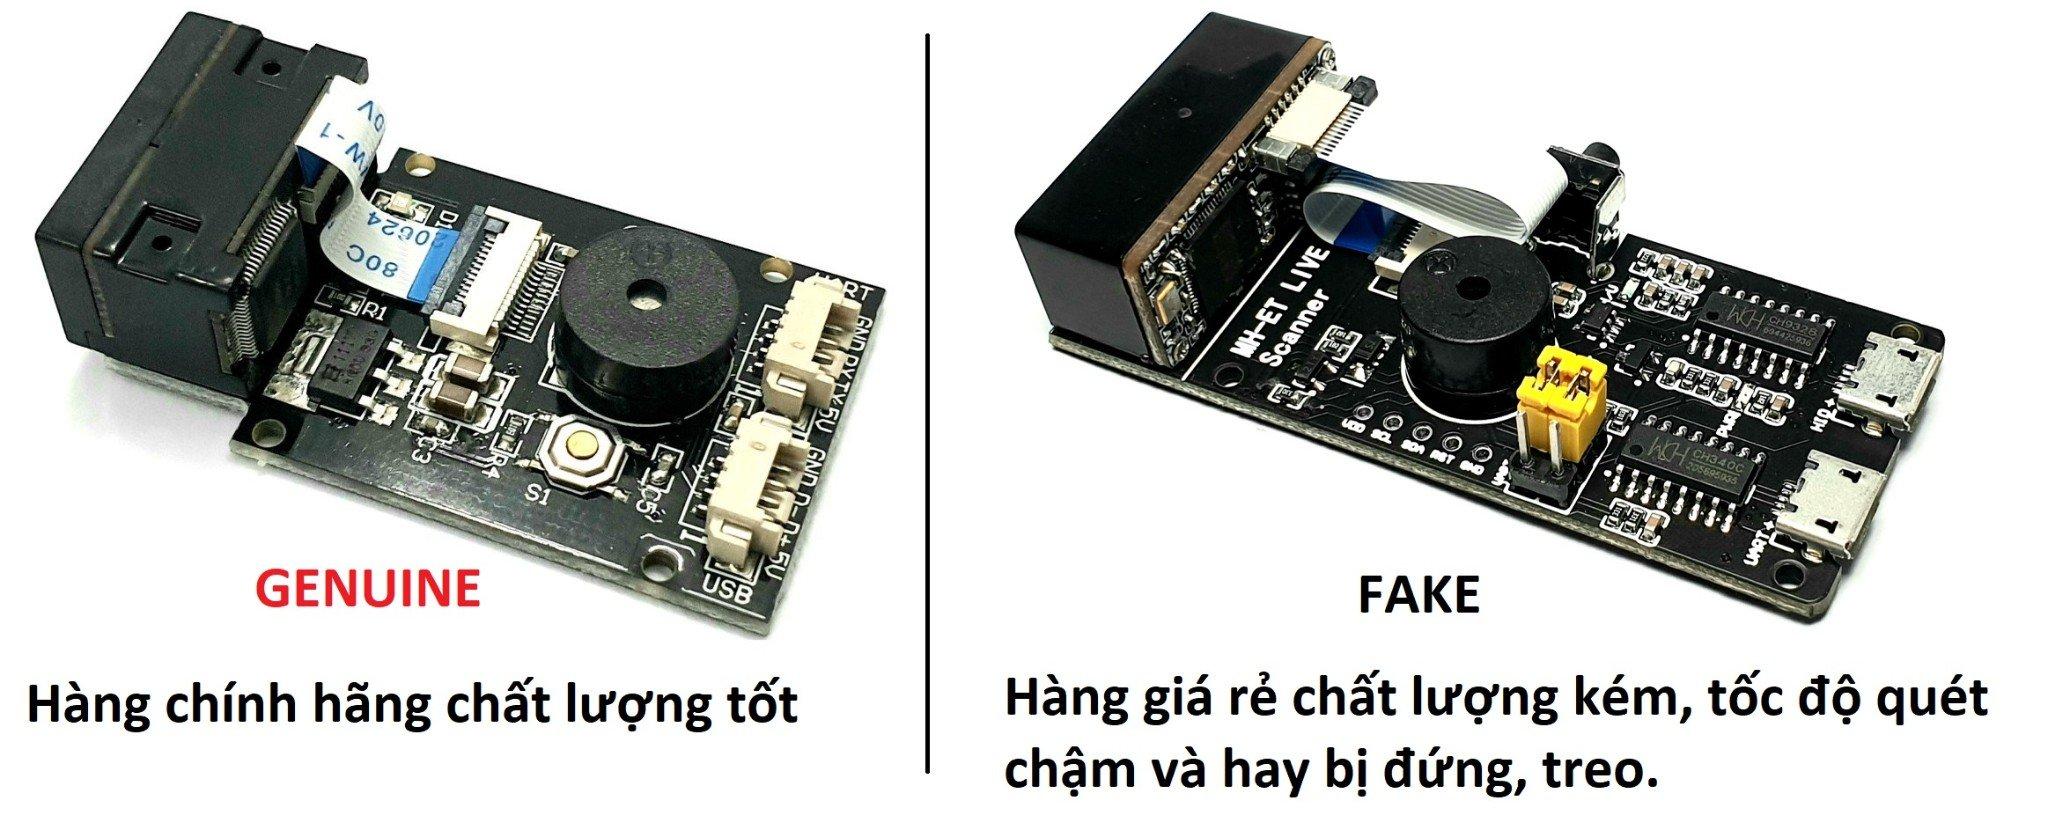 gm65 barcode scanner module fake